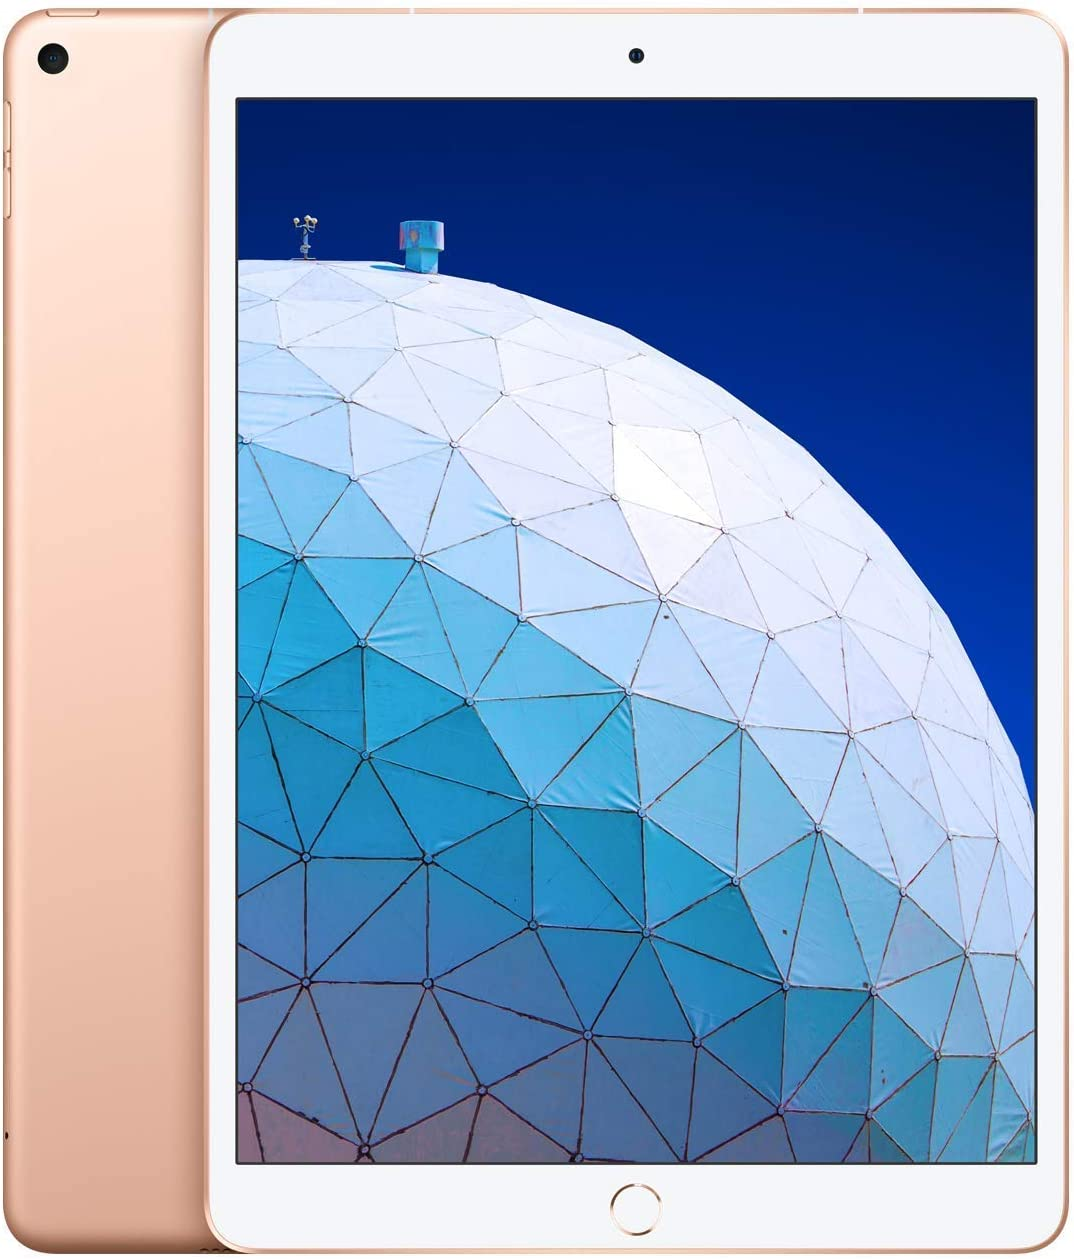 Apple iPadAir (10.5-inch, Wi-Fi + Cellular, 256GB) - Gold (Latest Model) (Renewed)